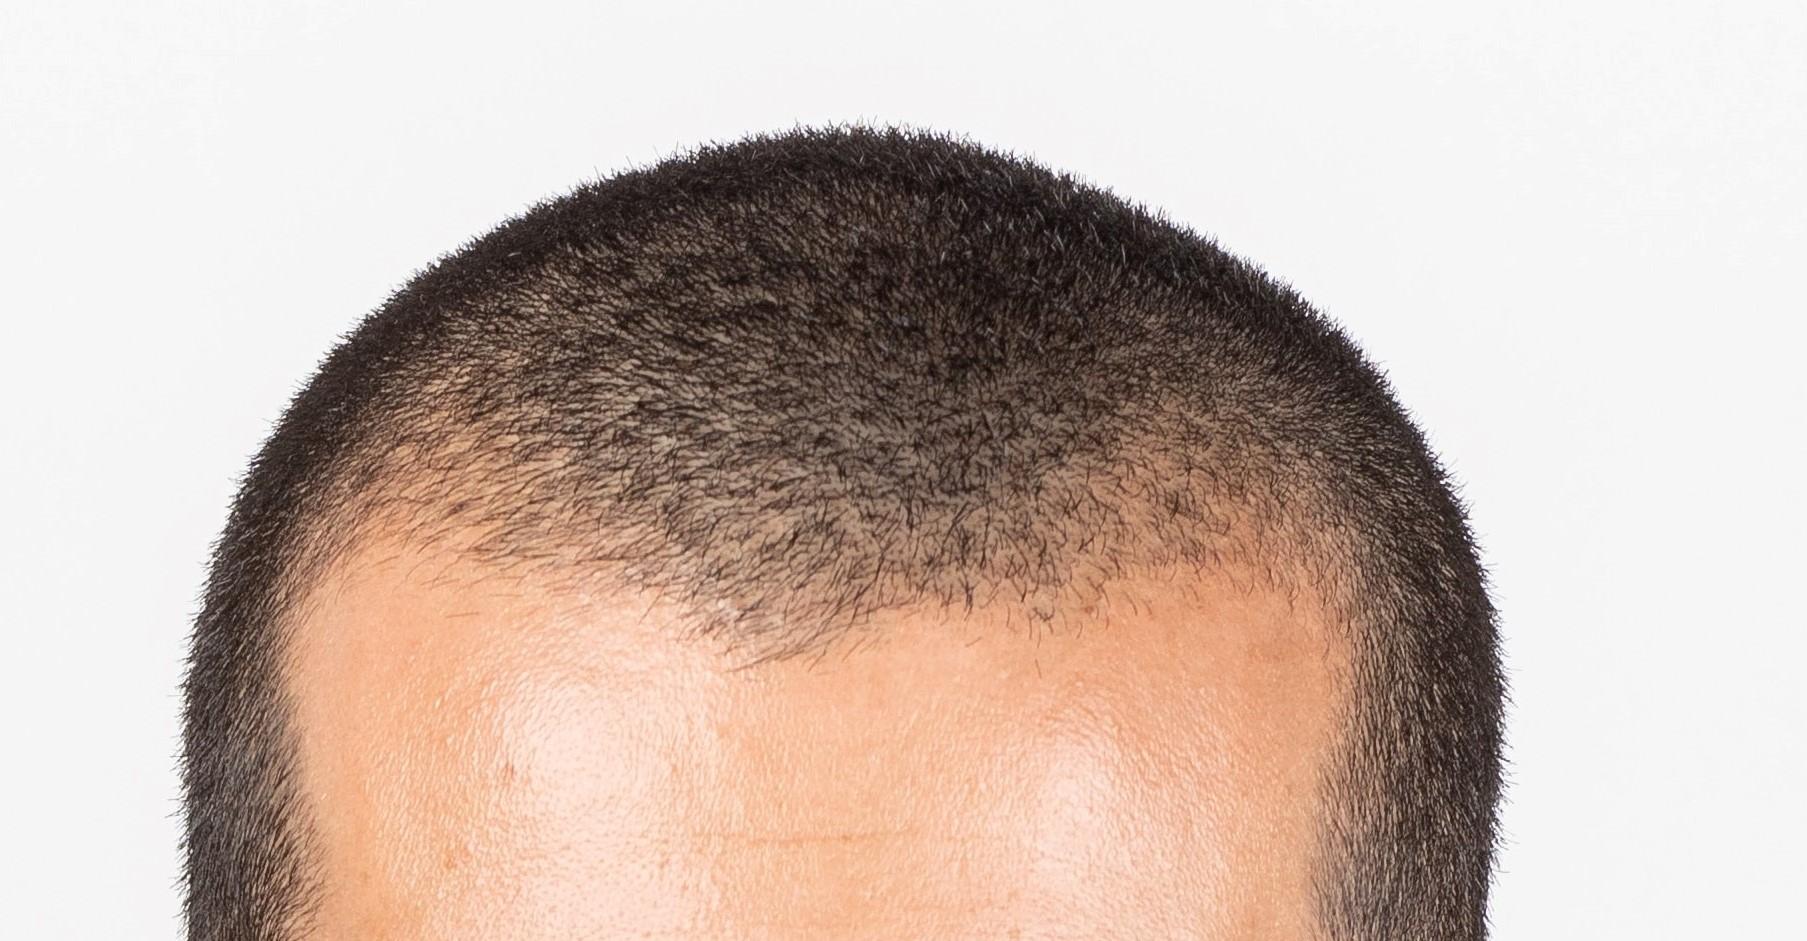 Helpful Ways to Restore Hair and Balance Hormones